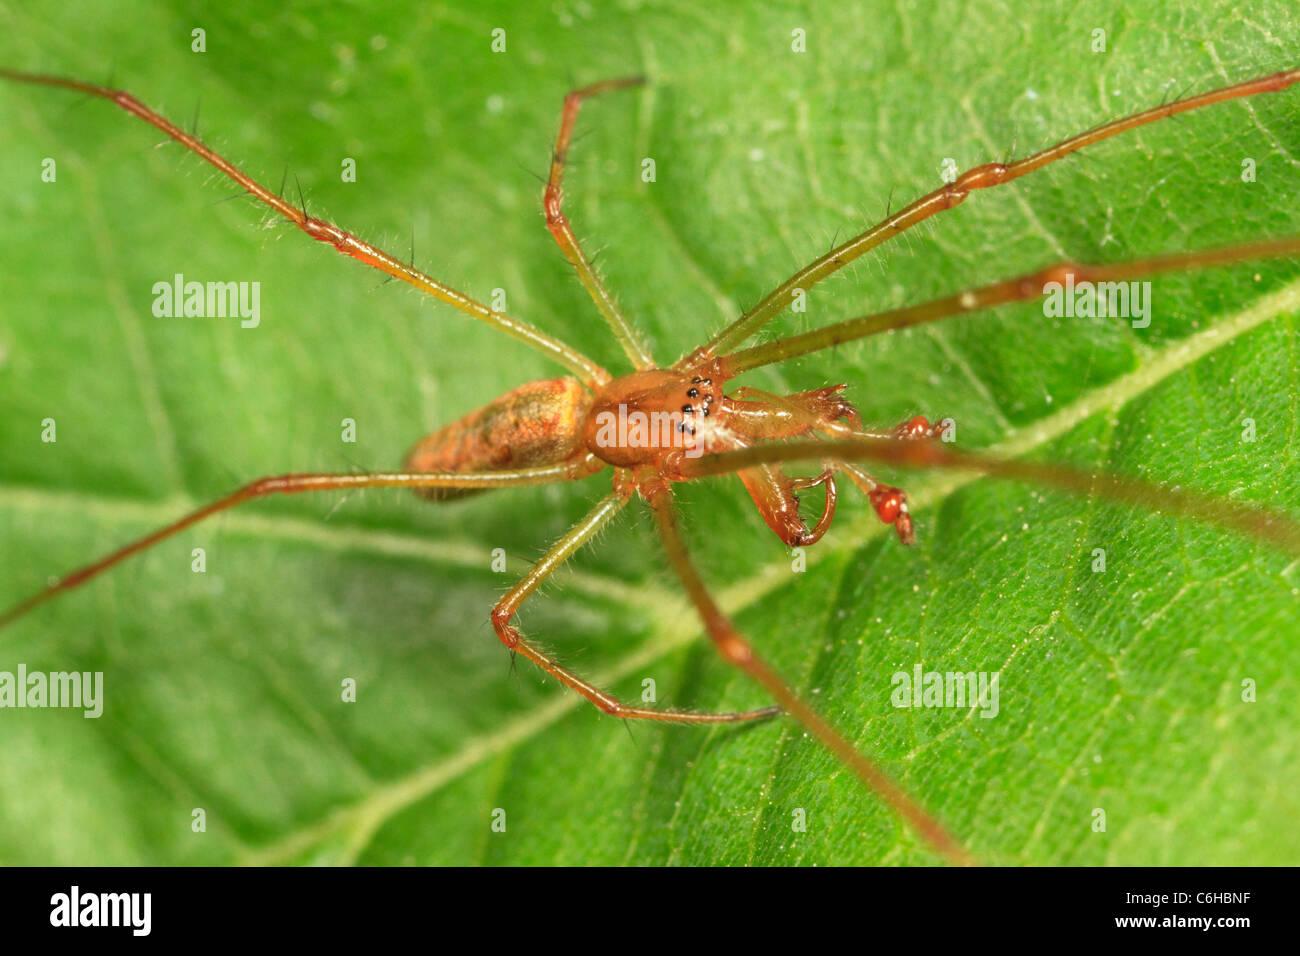 Longjawed orbweaver spider (Tetragnatha sp.) - Stock Image